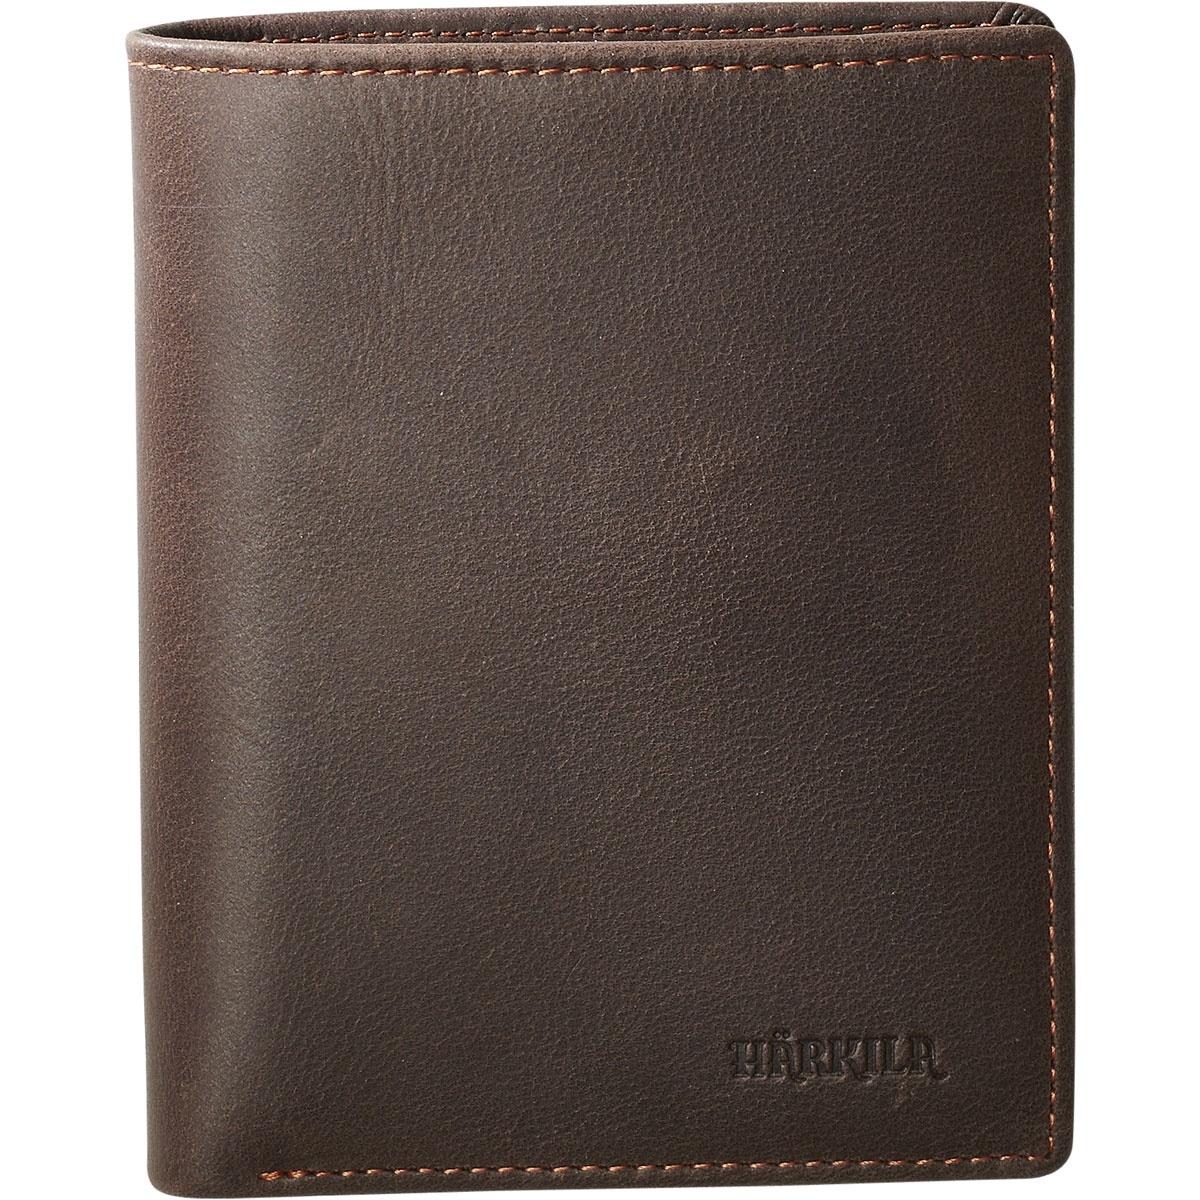 Härkila Wallet With Coin Room Dark Brown-1